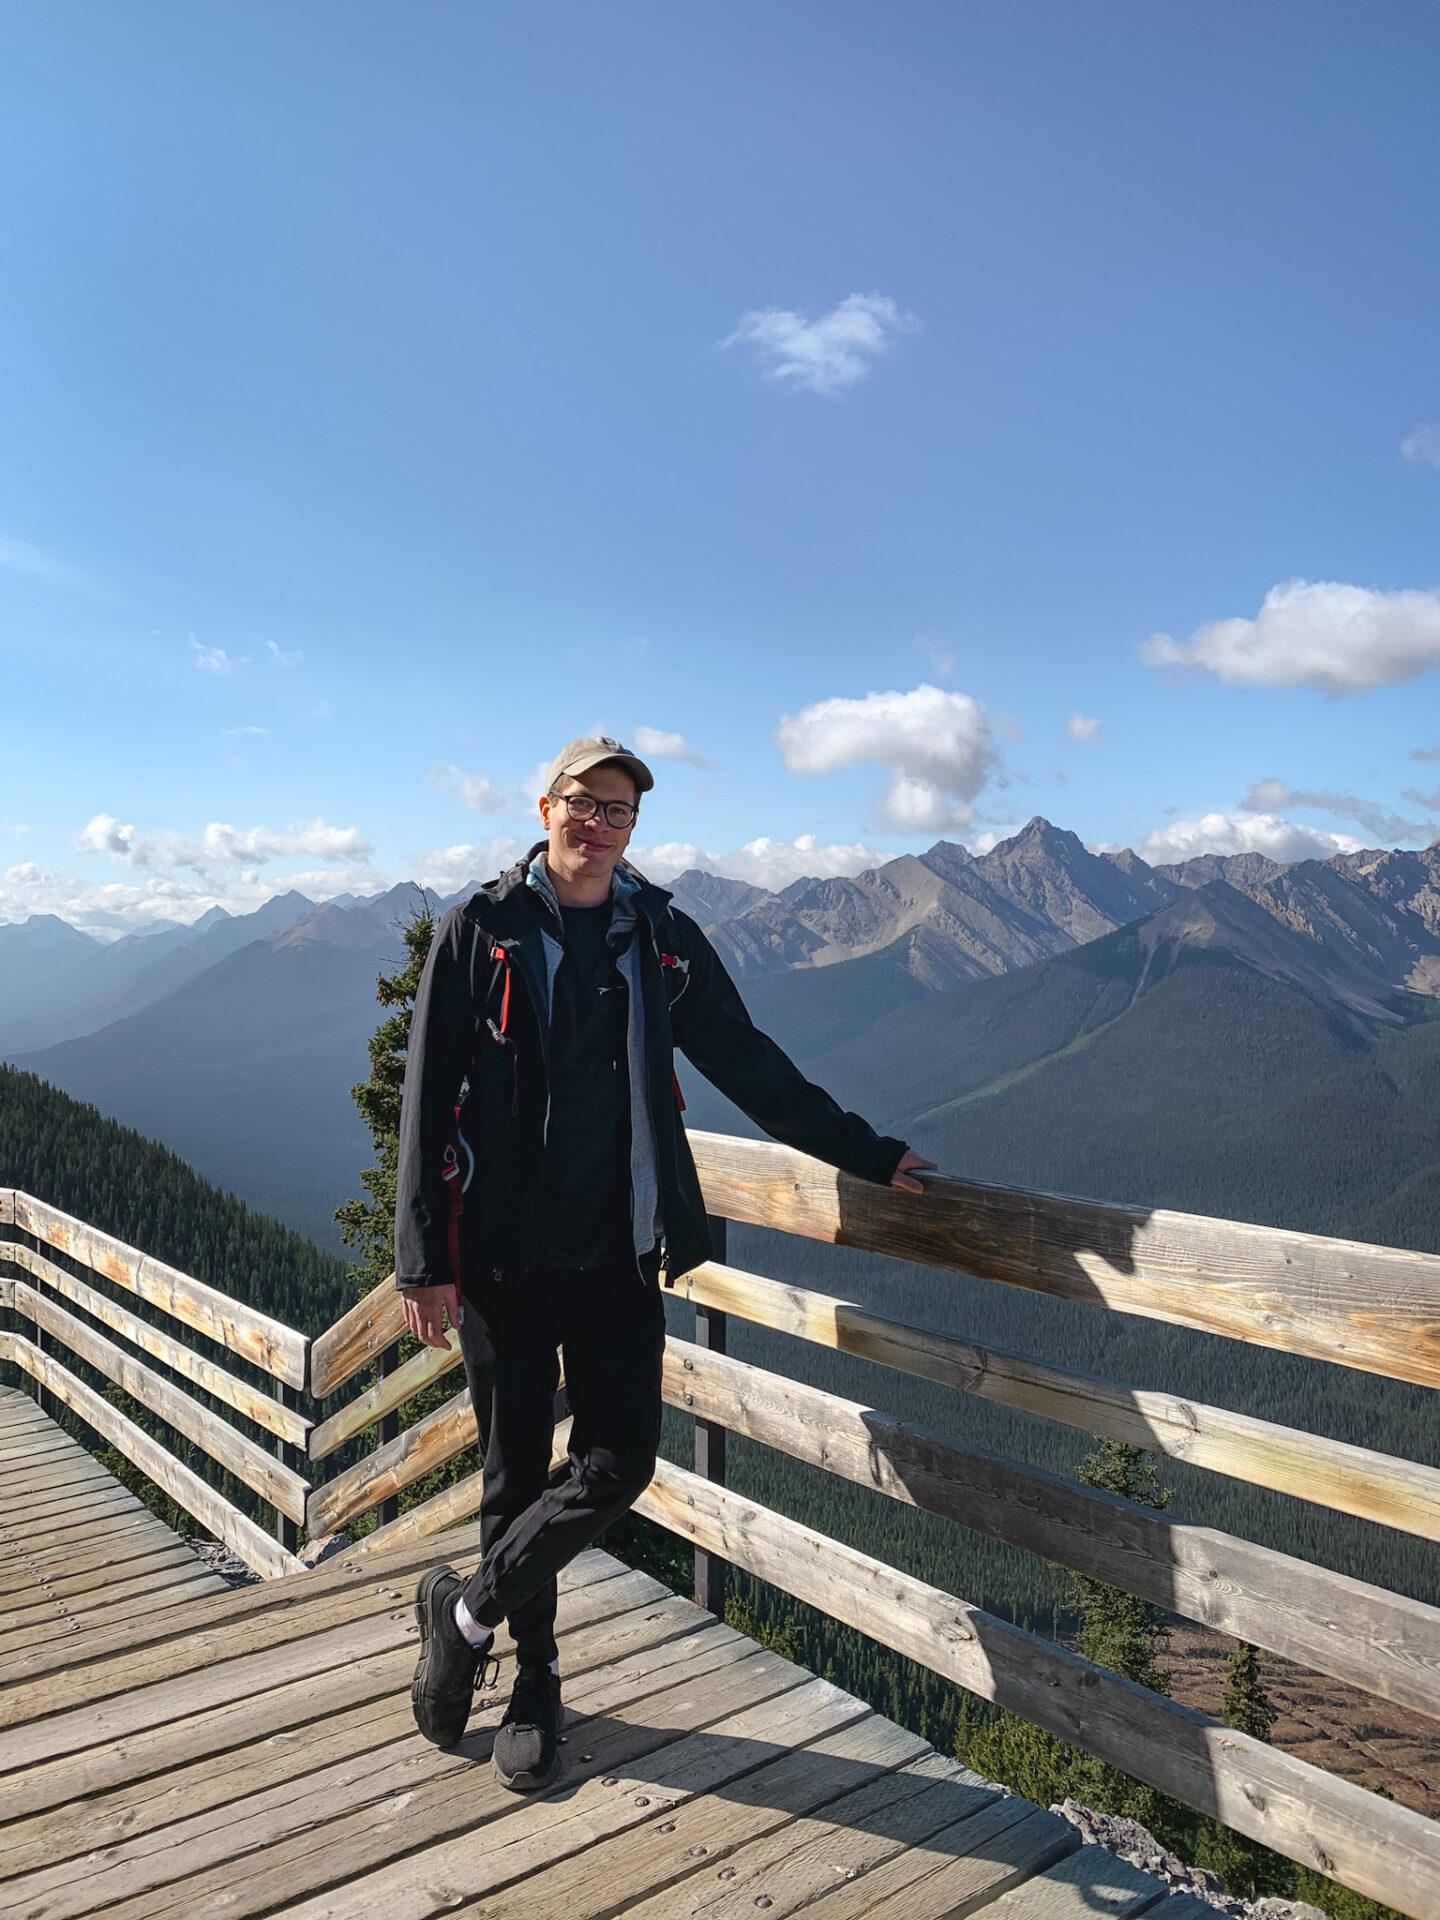 Banff Gondola boardwalk at Sulphur Mountain in the Canadian Rockies, Alberta